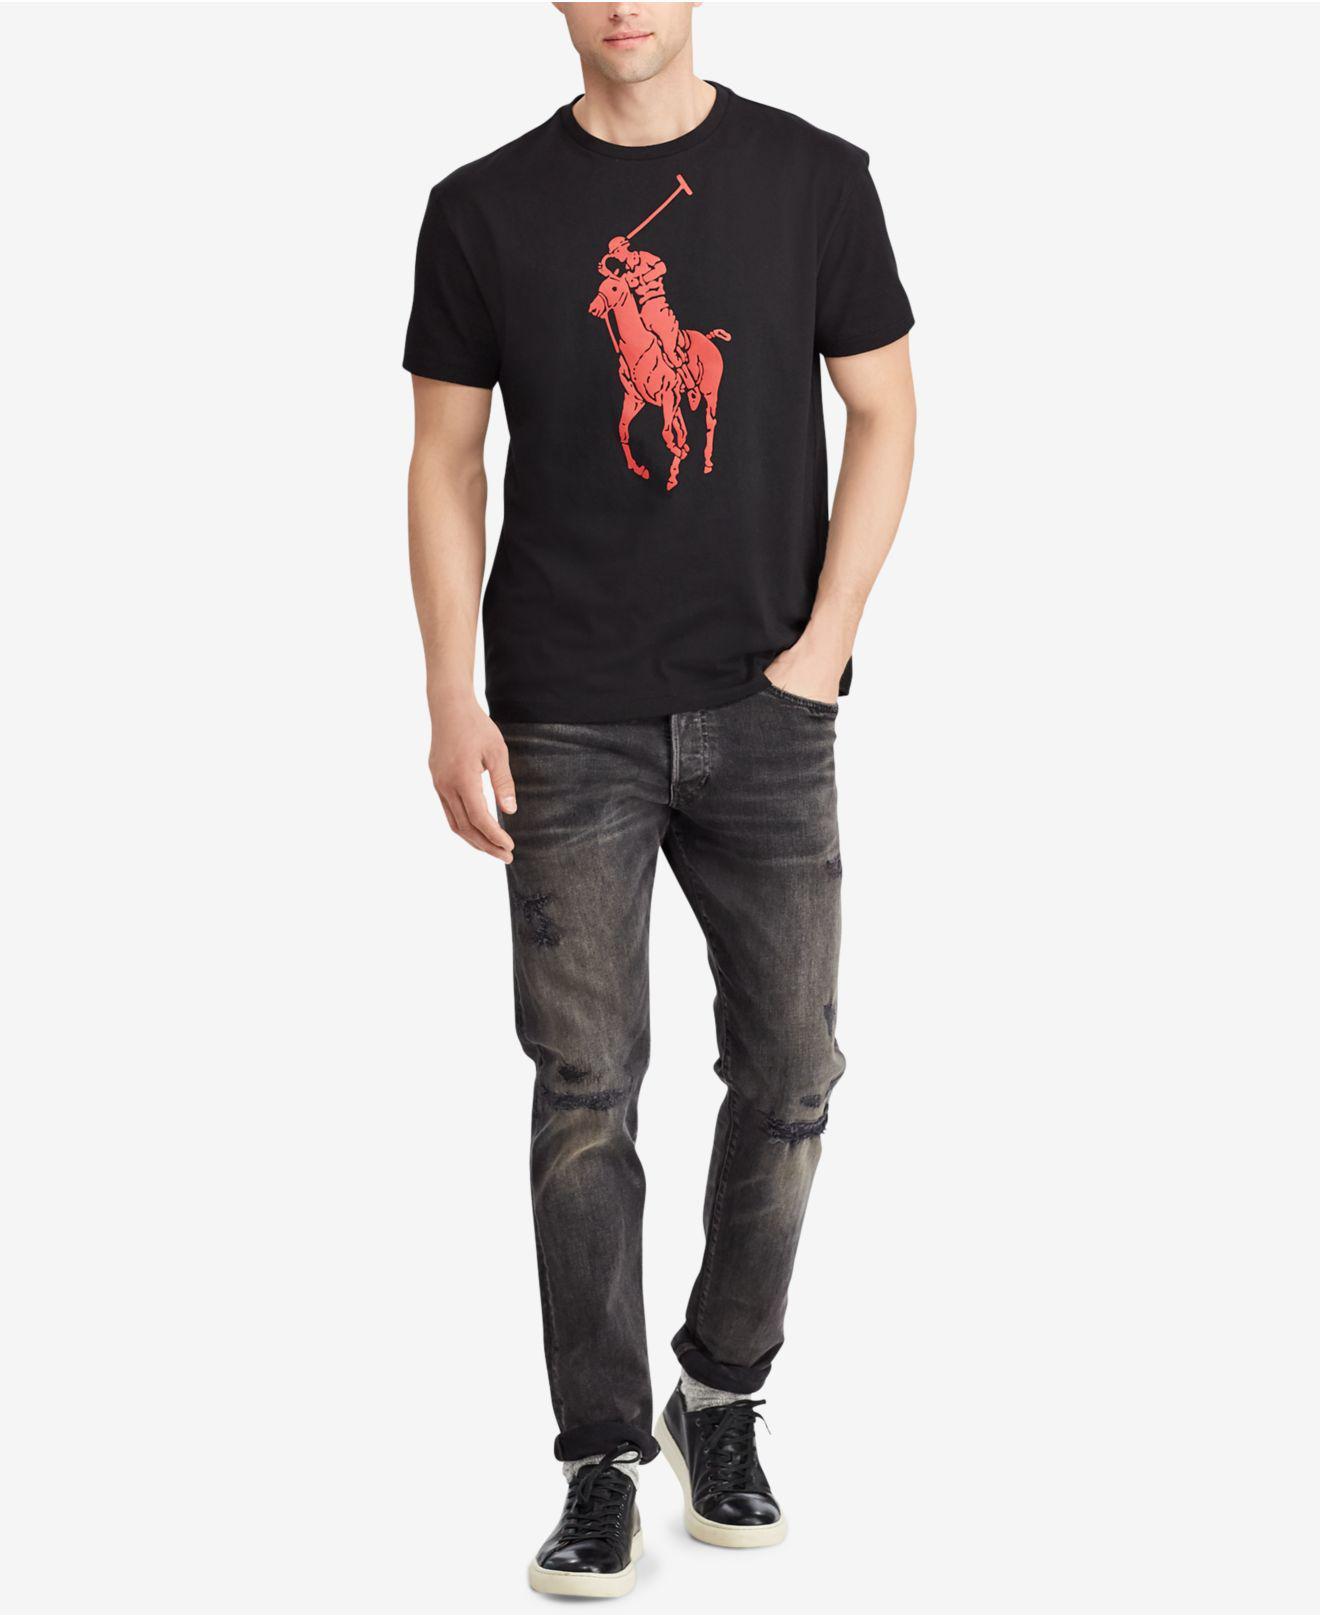 821b623f2 Polo Ralph Lauren - Black Polo Pony T-shirt for Men - Lyst. View fullscreen